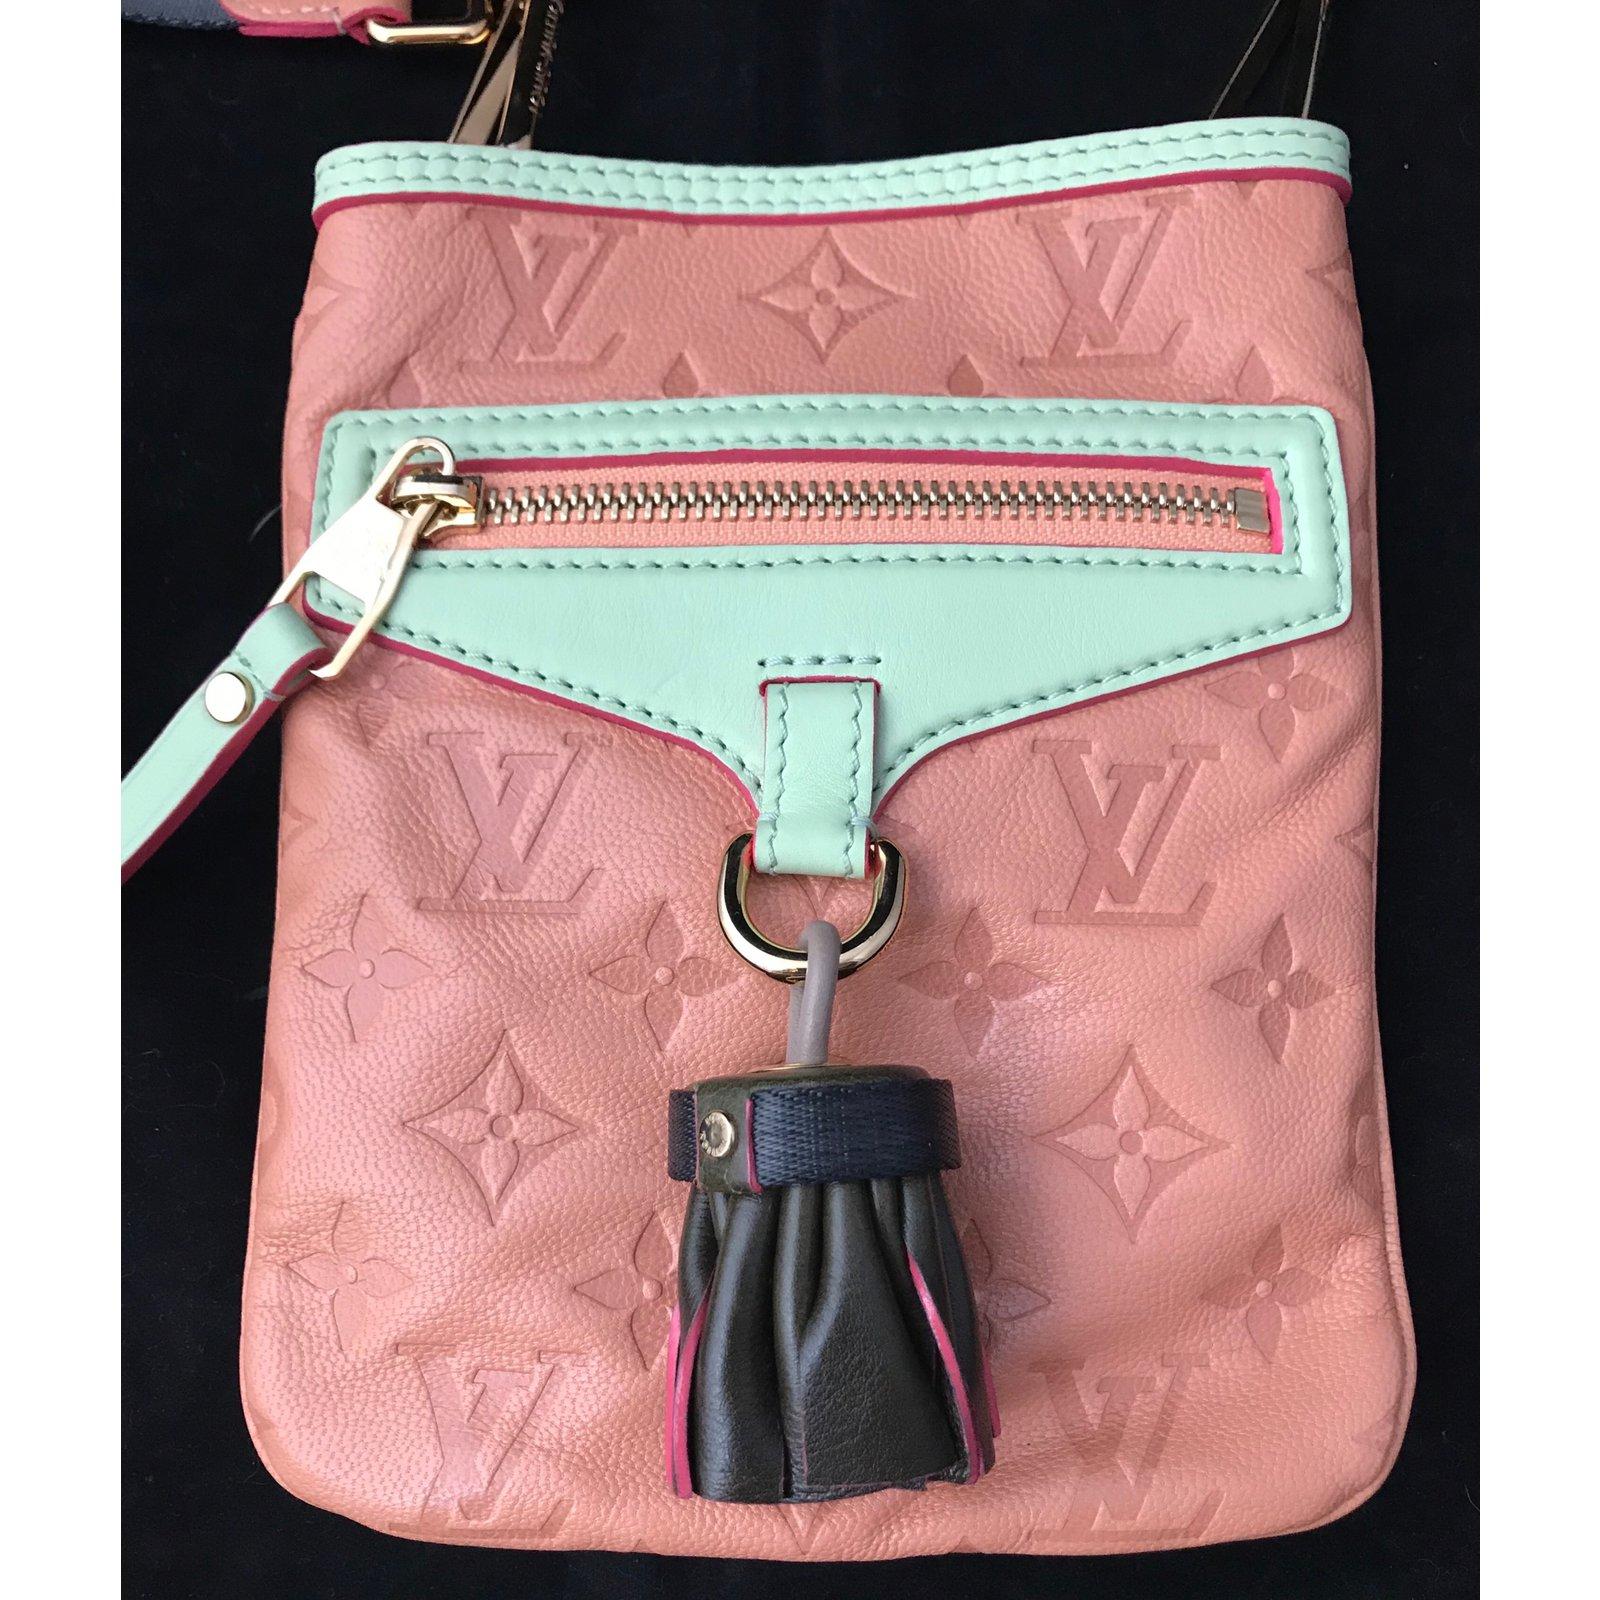 e76669104724 Louis Vuitton Under-Flat collection spring summer 2010 Handbags Leather  Pink ref.92824 - Joli Closet